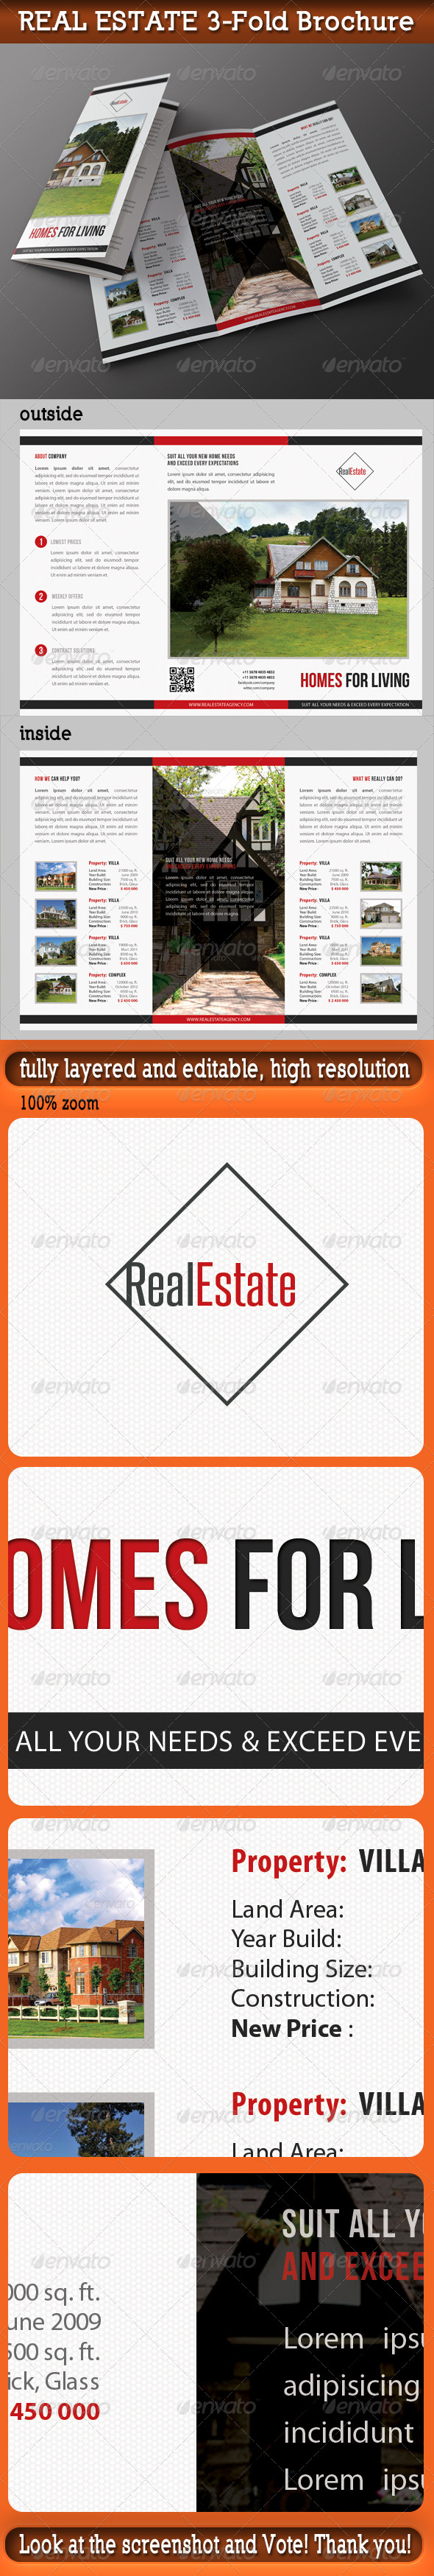 Real Estate 3-Fold Brochure 01 - Brochures Print Templates